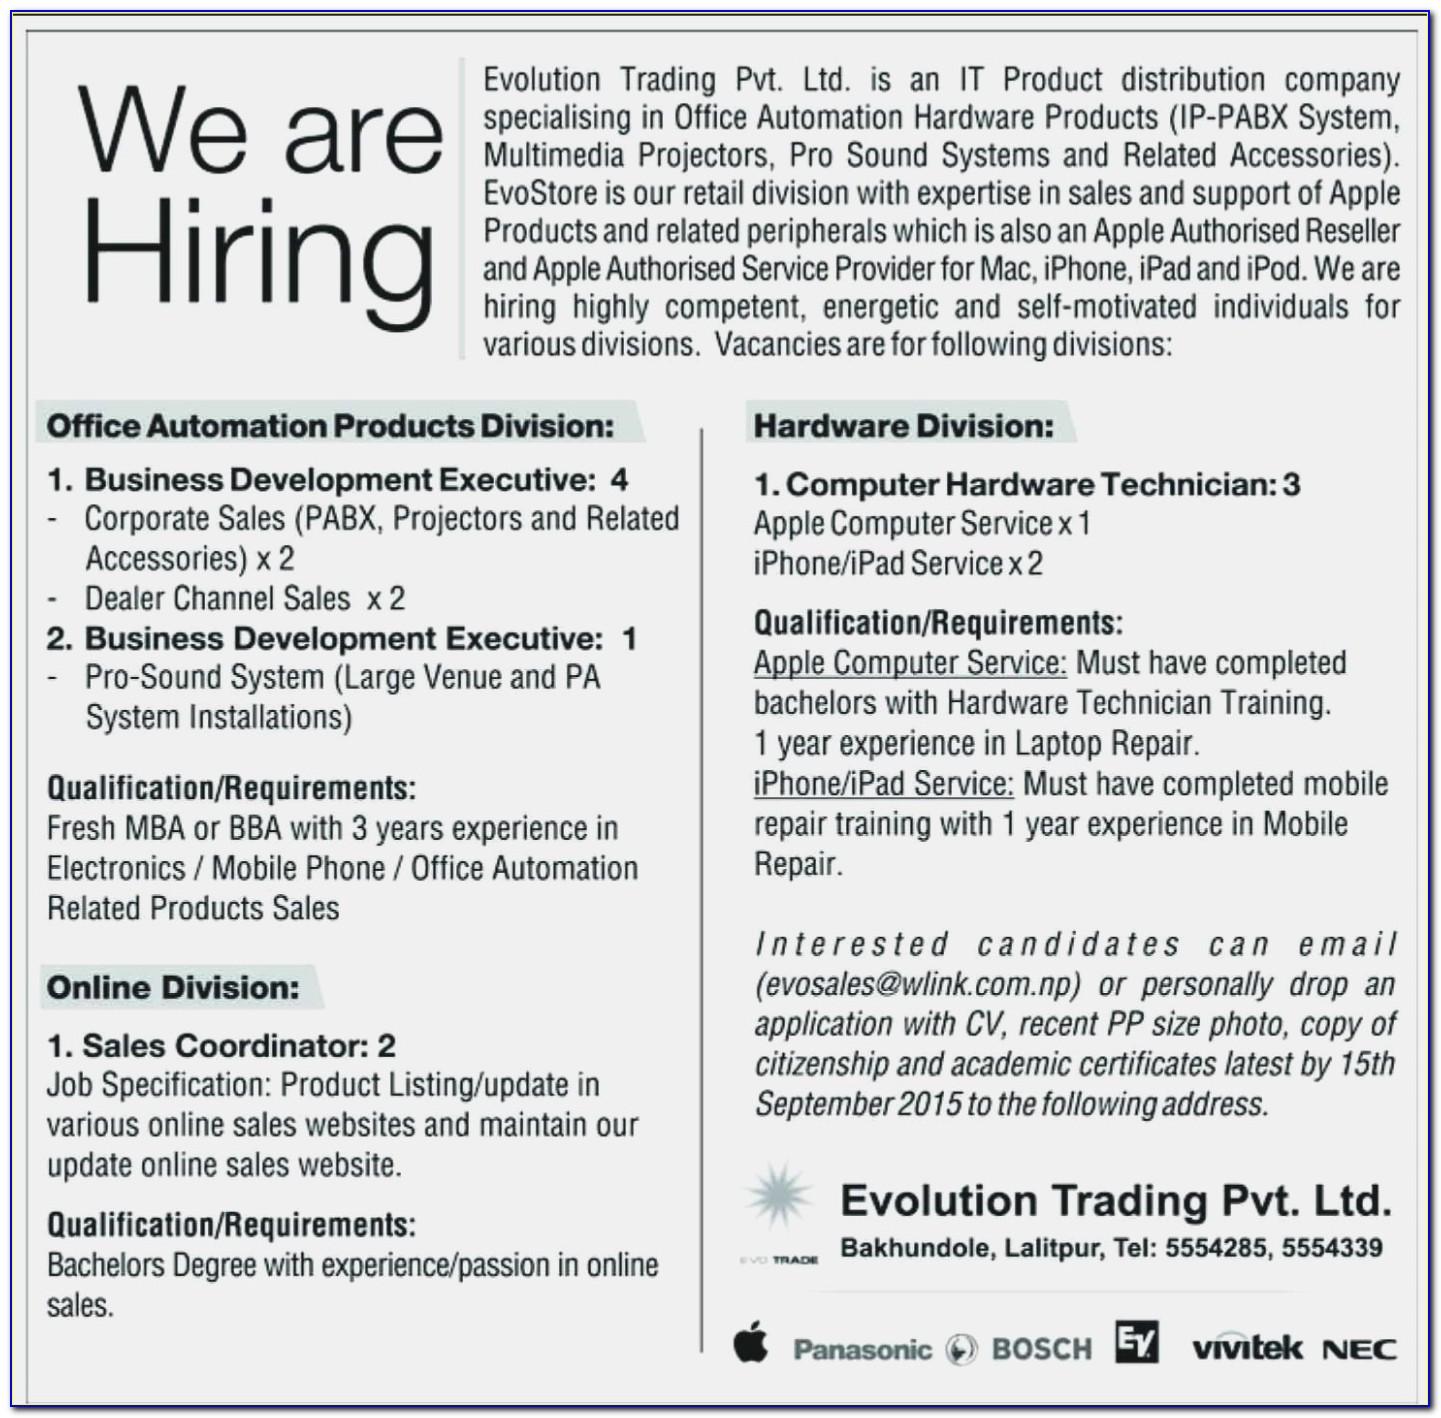 Professional Resume Service Near Me Beautiful Line Job Applications Regarding Job Applications Near Me